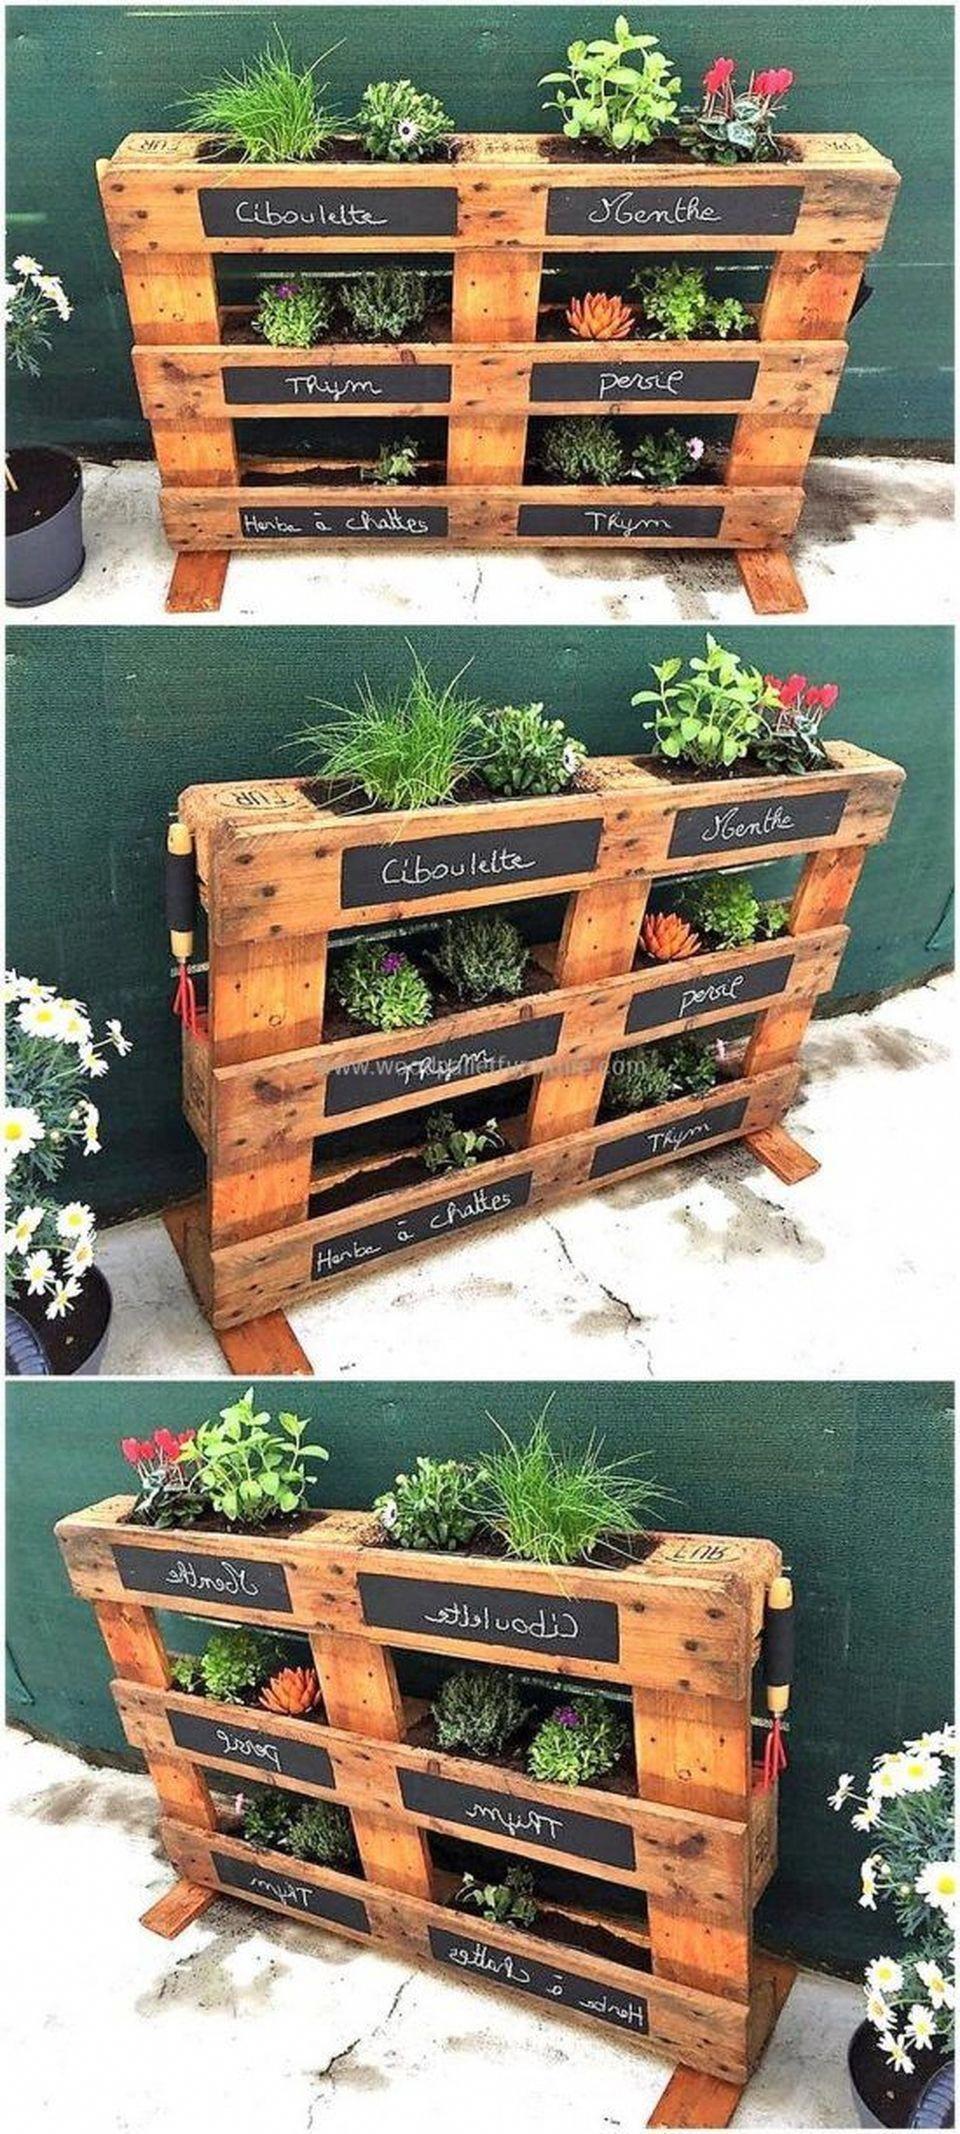 60 Amazing Creative Wood Pallet Garden Project Ideas Urbangardening Pallet Projects Garden Pallet Garden Ideas Diy Pallets Garden